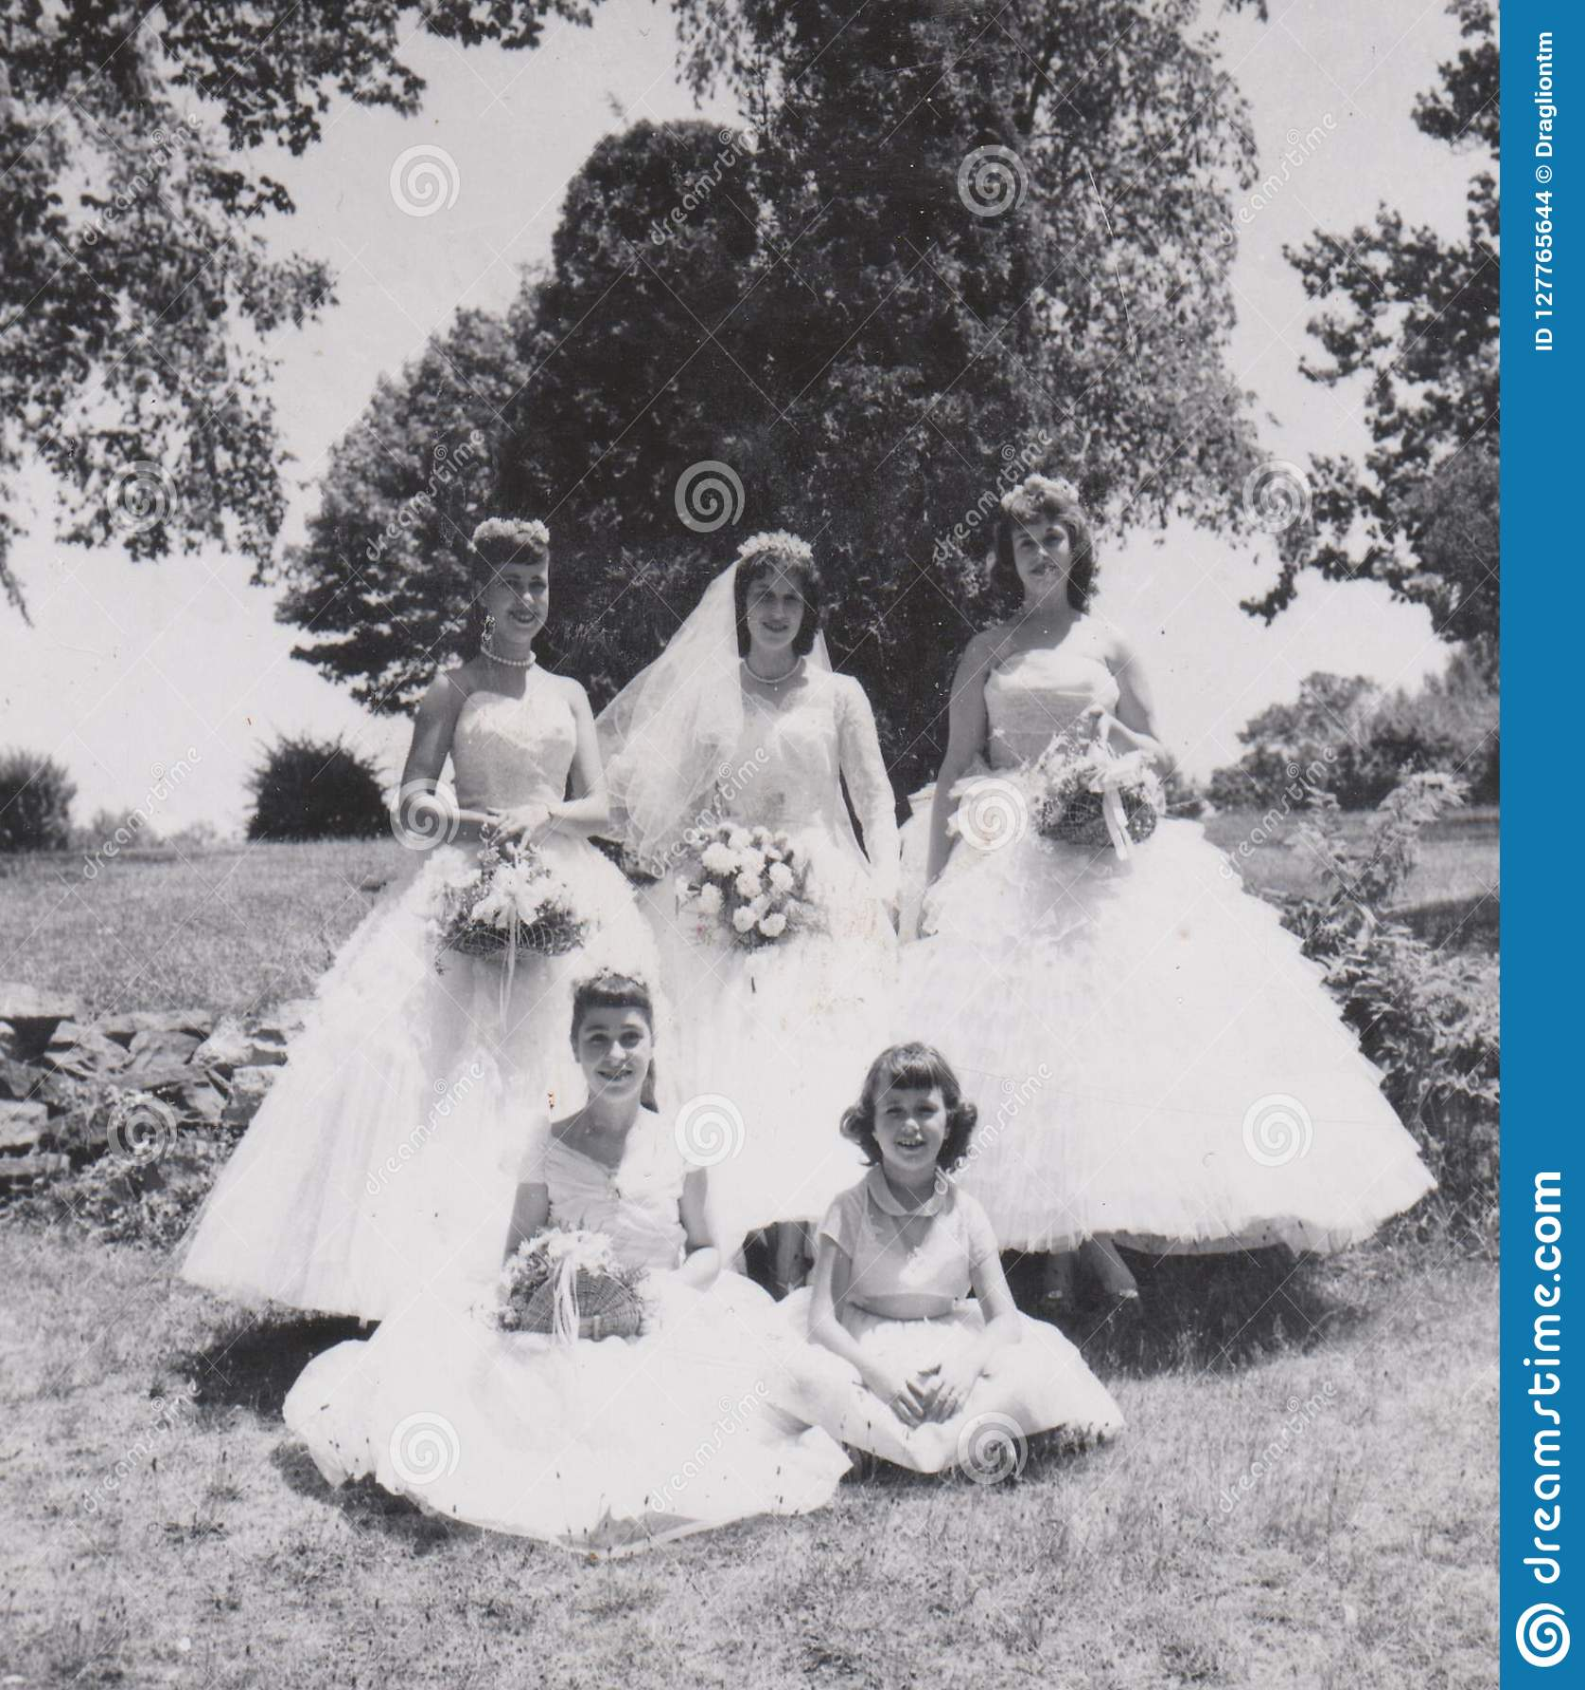 vintage nevr-fade photo -bridesmaids year 1957 wedding party